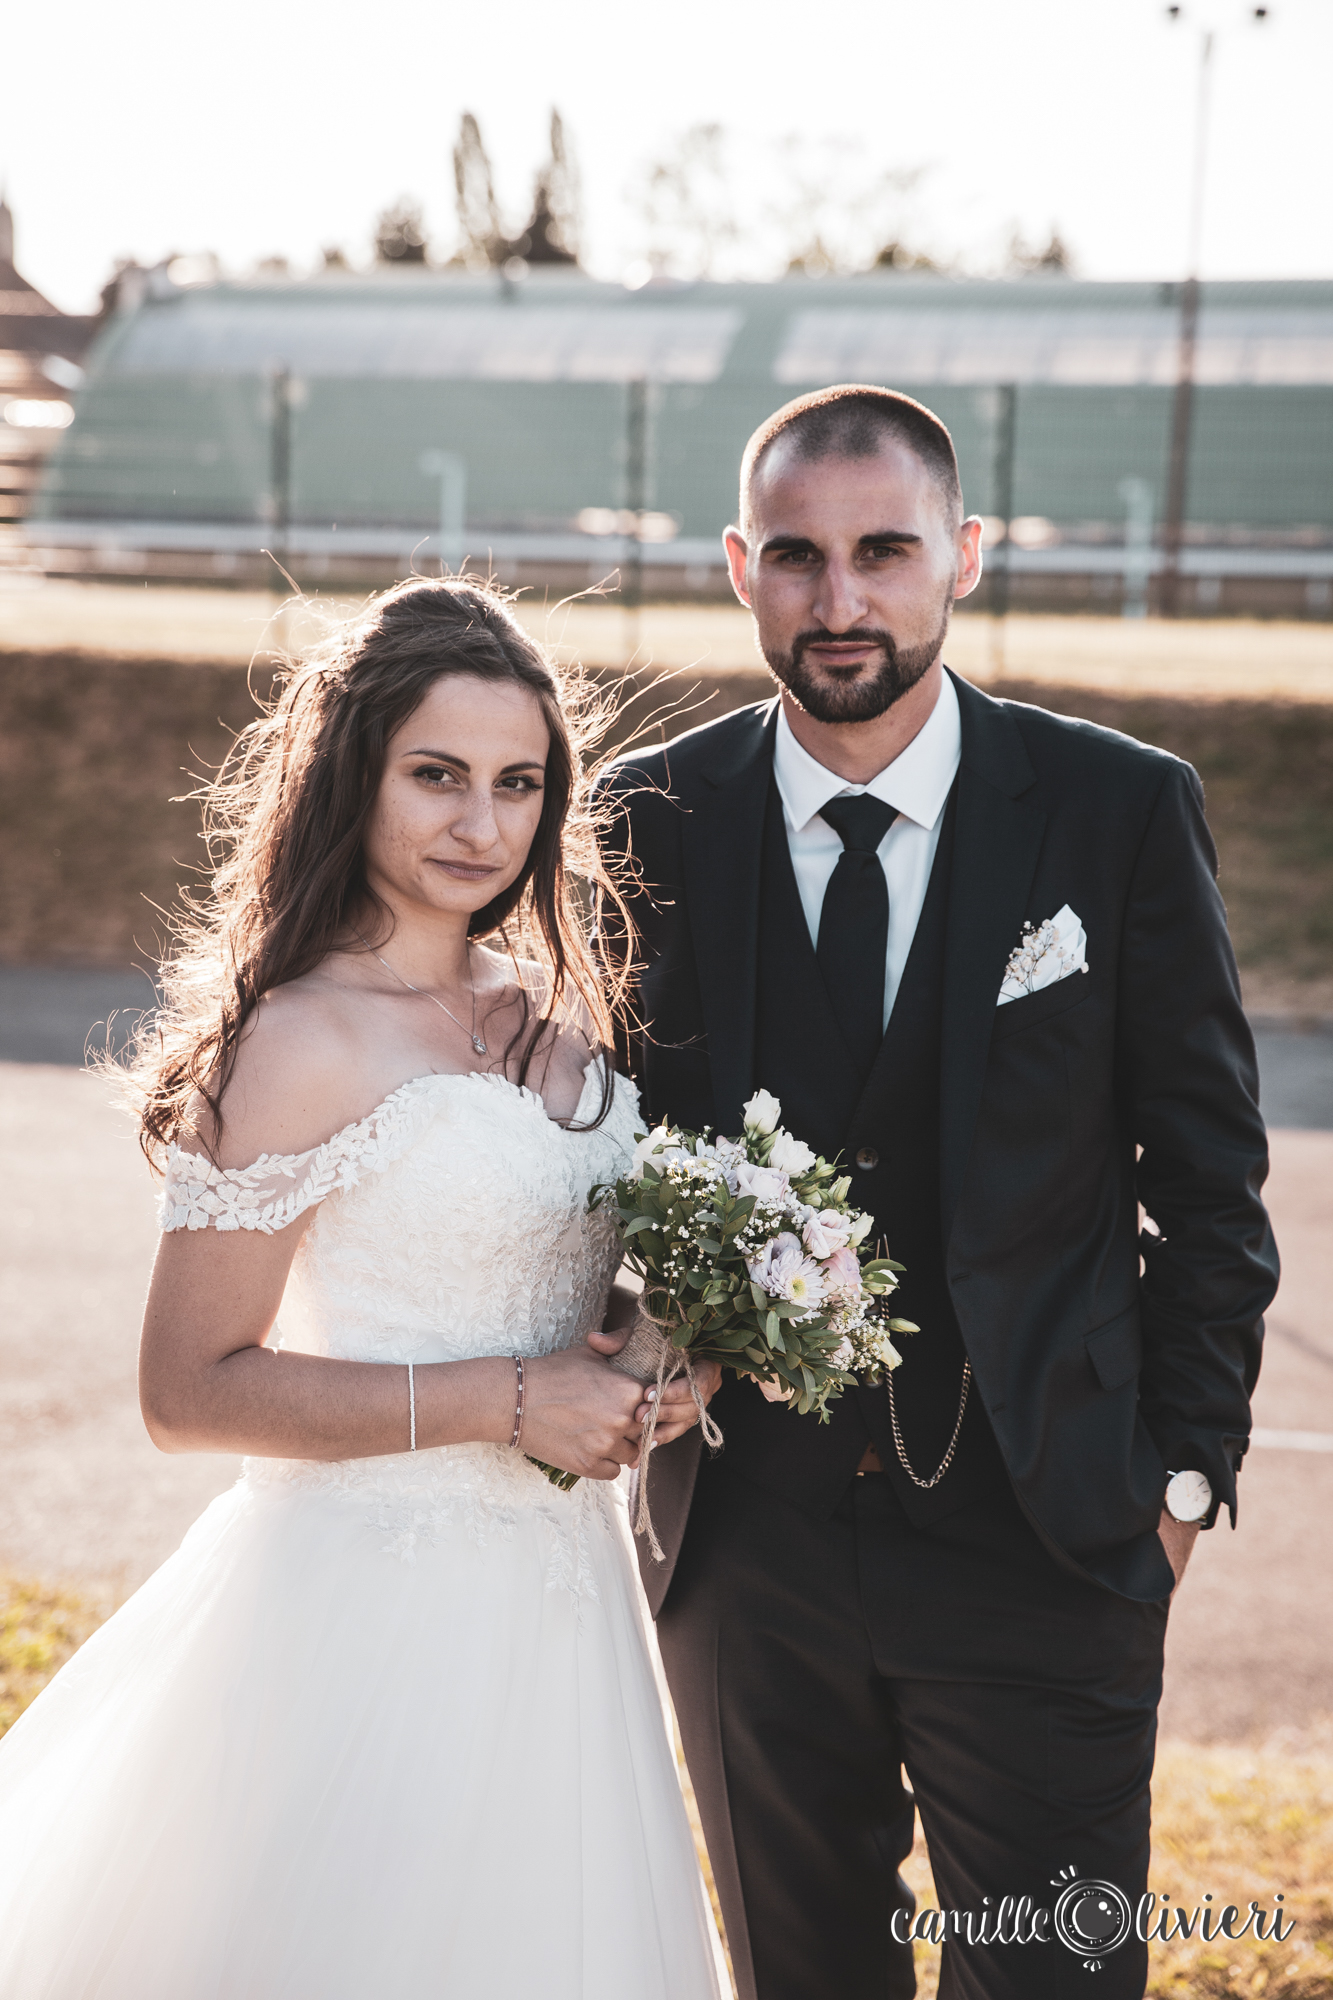 photographe_grenoble_mariage-camille-olivieri-69